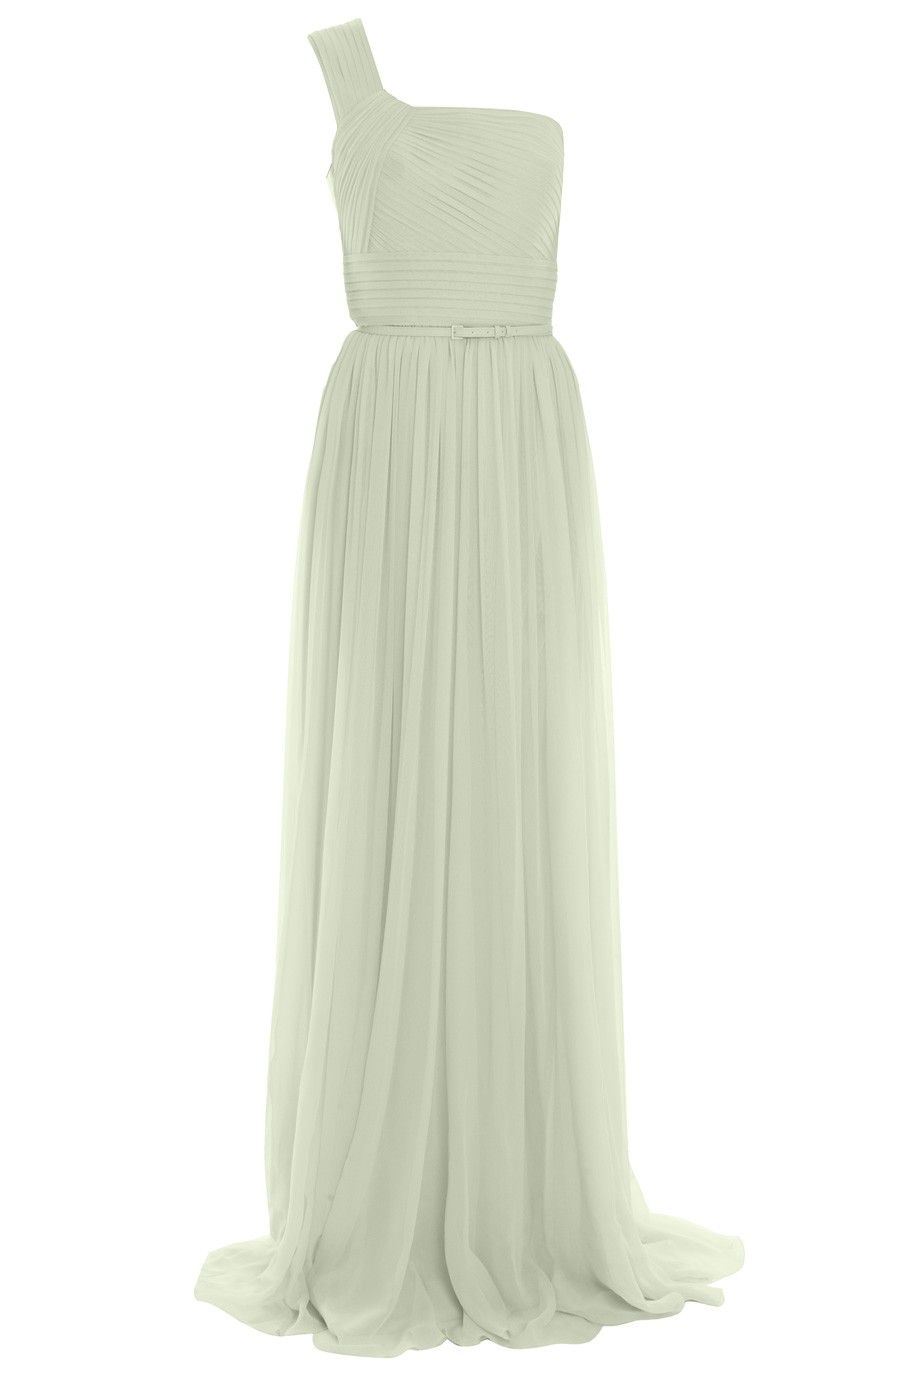 ELIE SAABLk18 1 Shldr Chiffon Dress